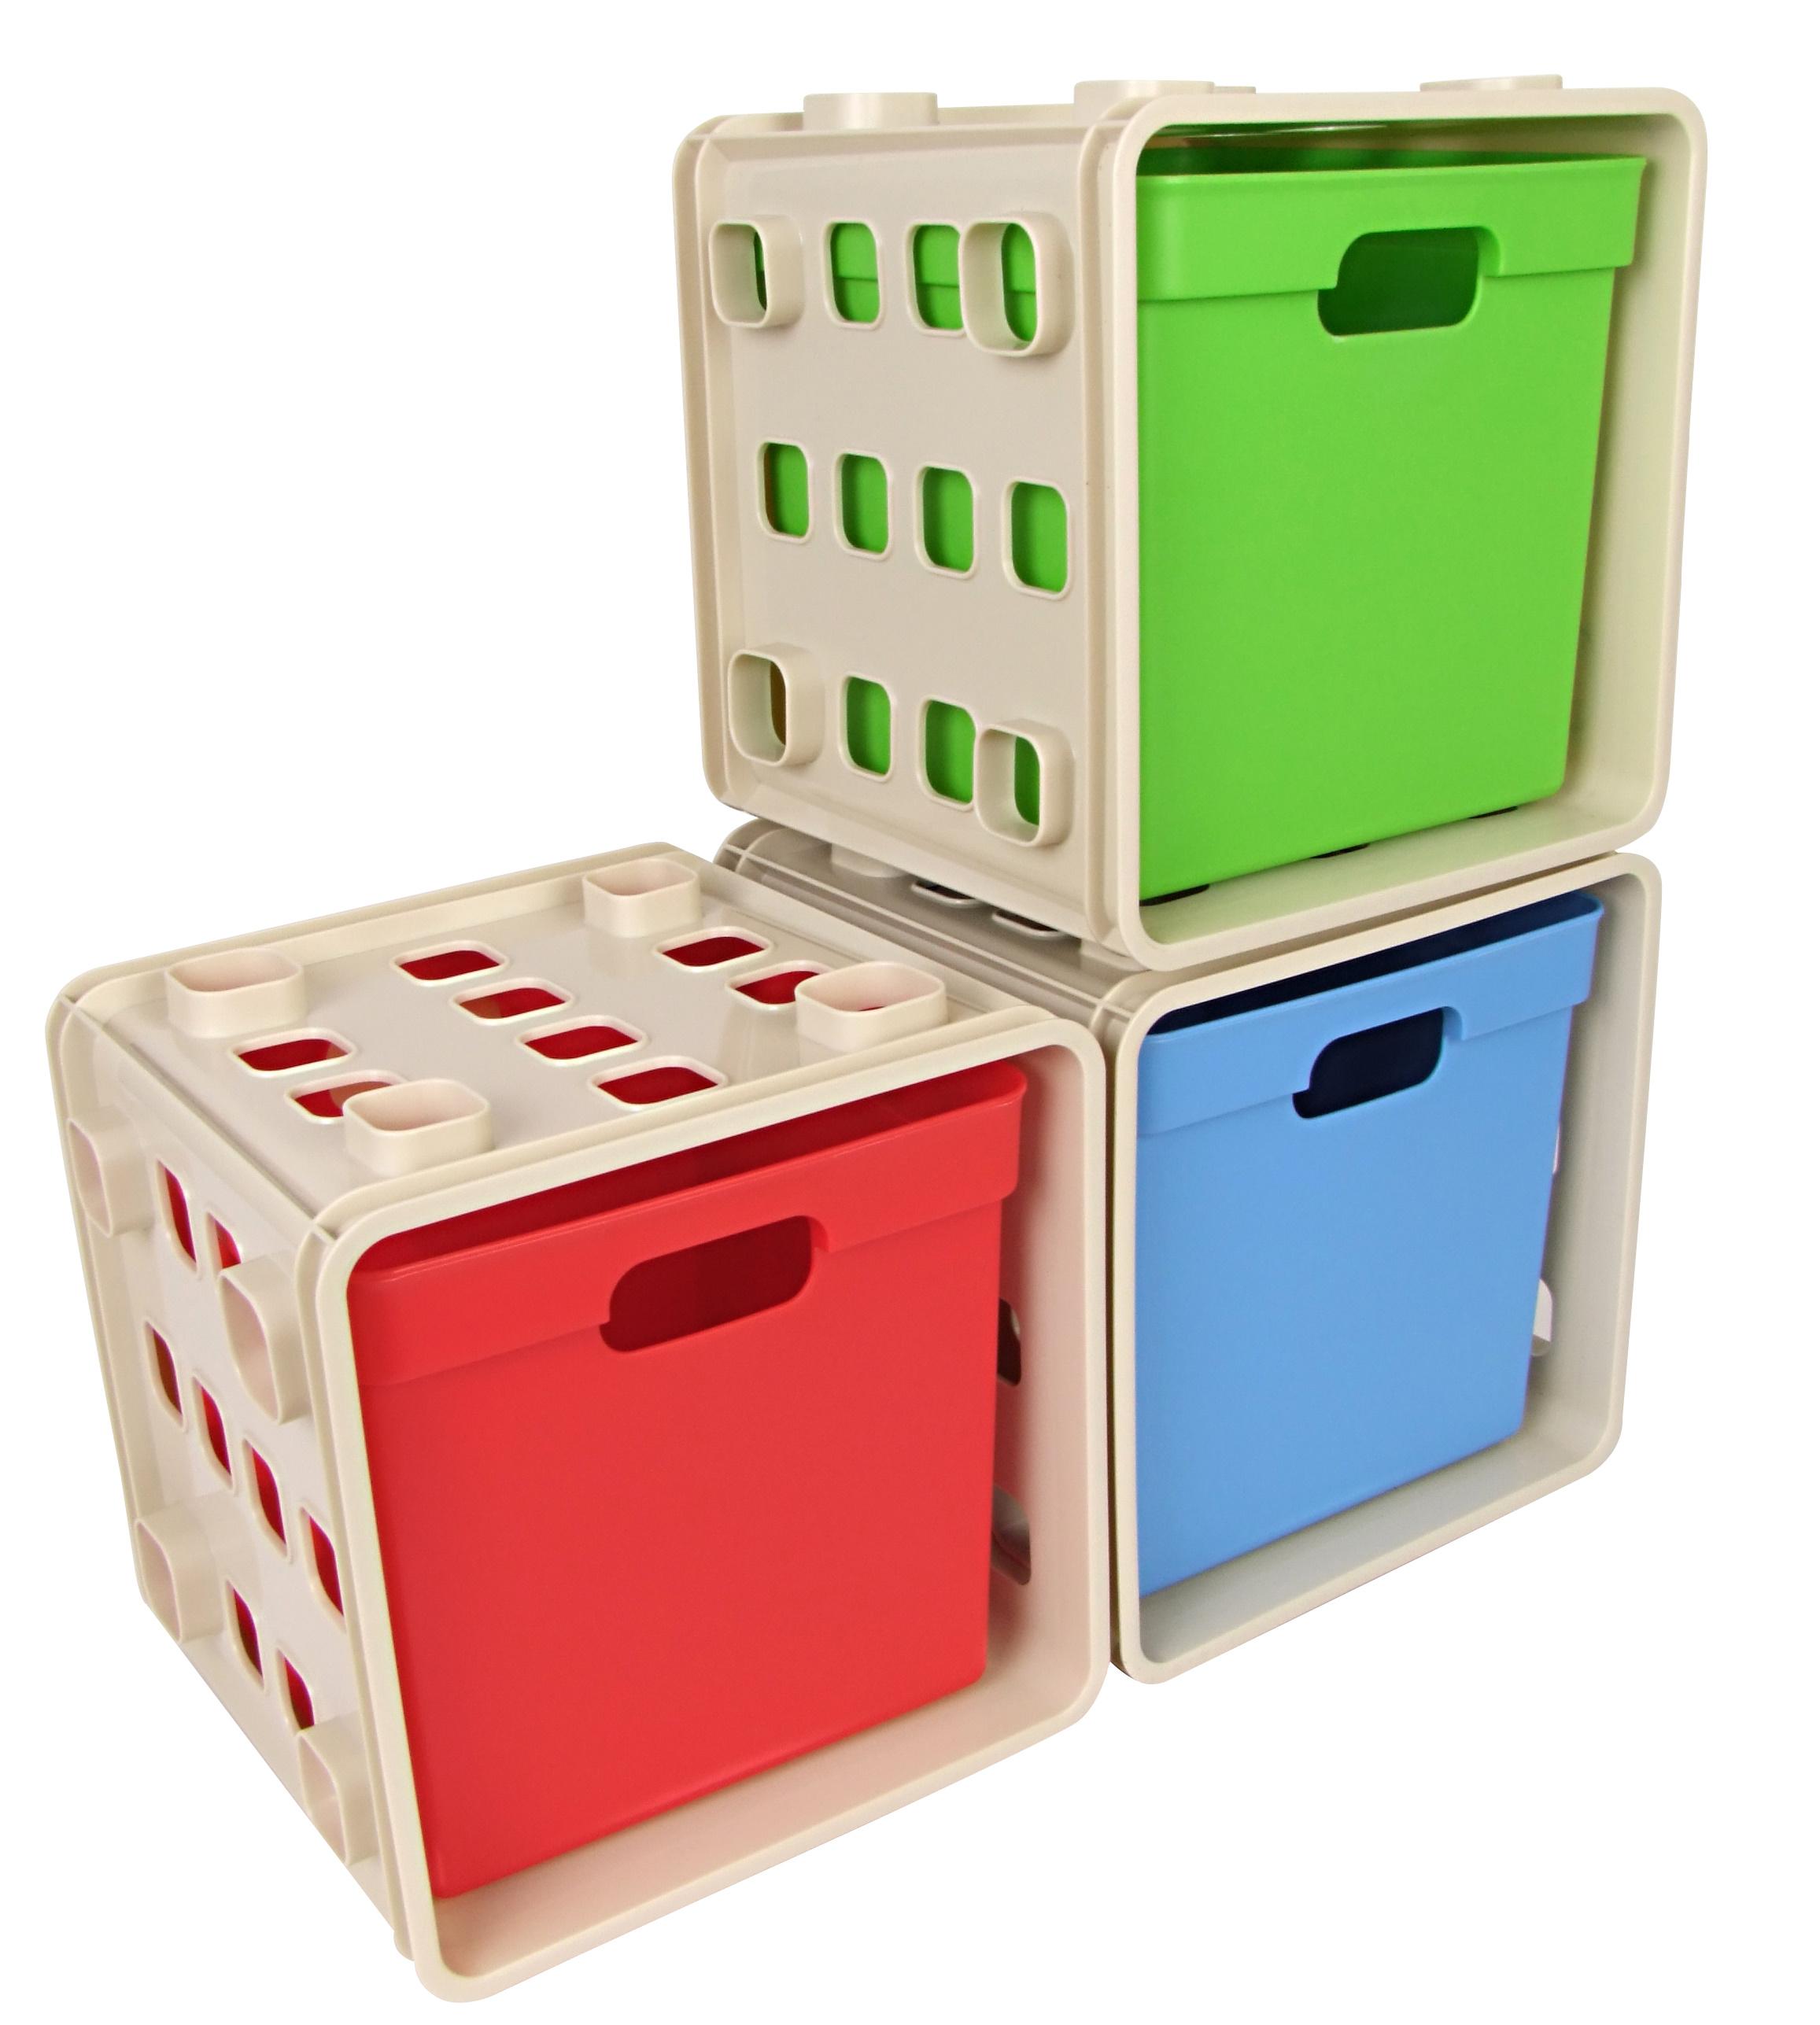 Details zu Kinder Modulregal Steckregal Kinderzimmer Regal Regalsystem  Spielzeug Kiste Box